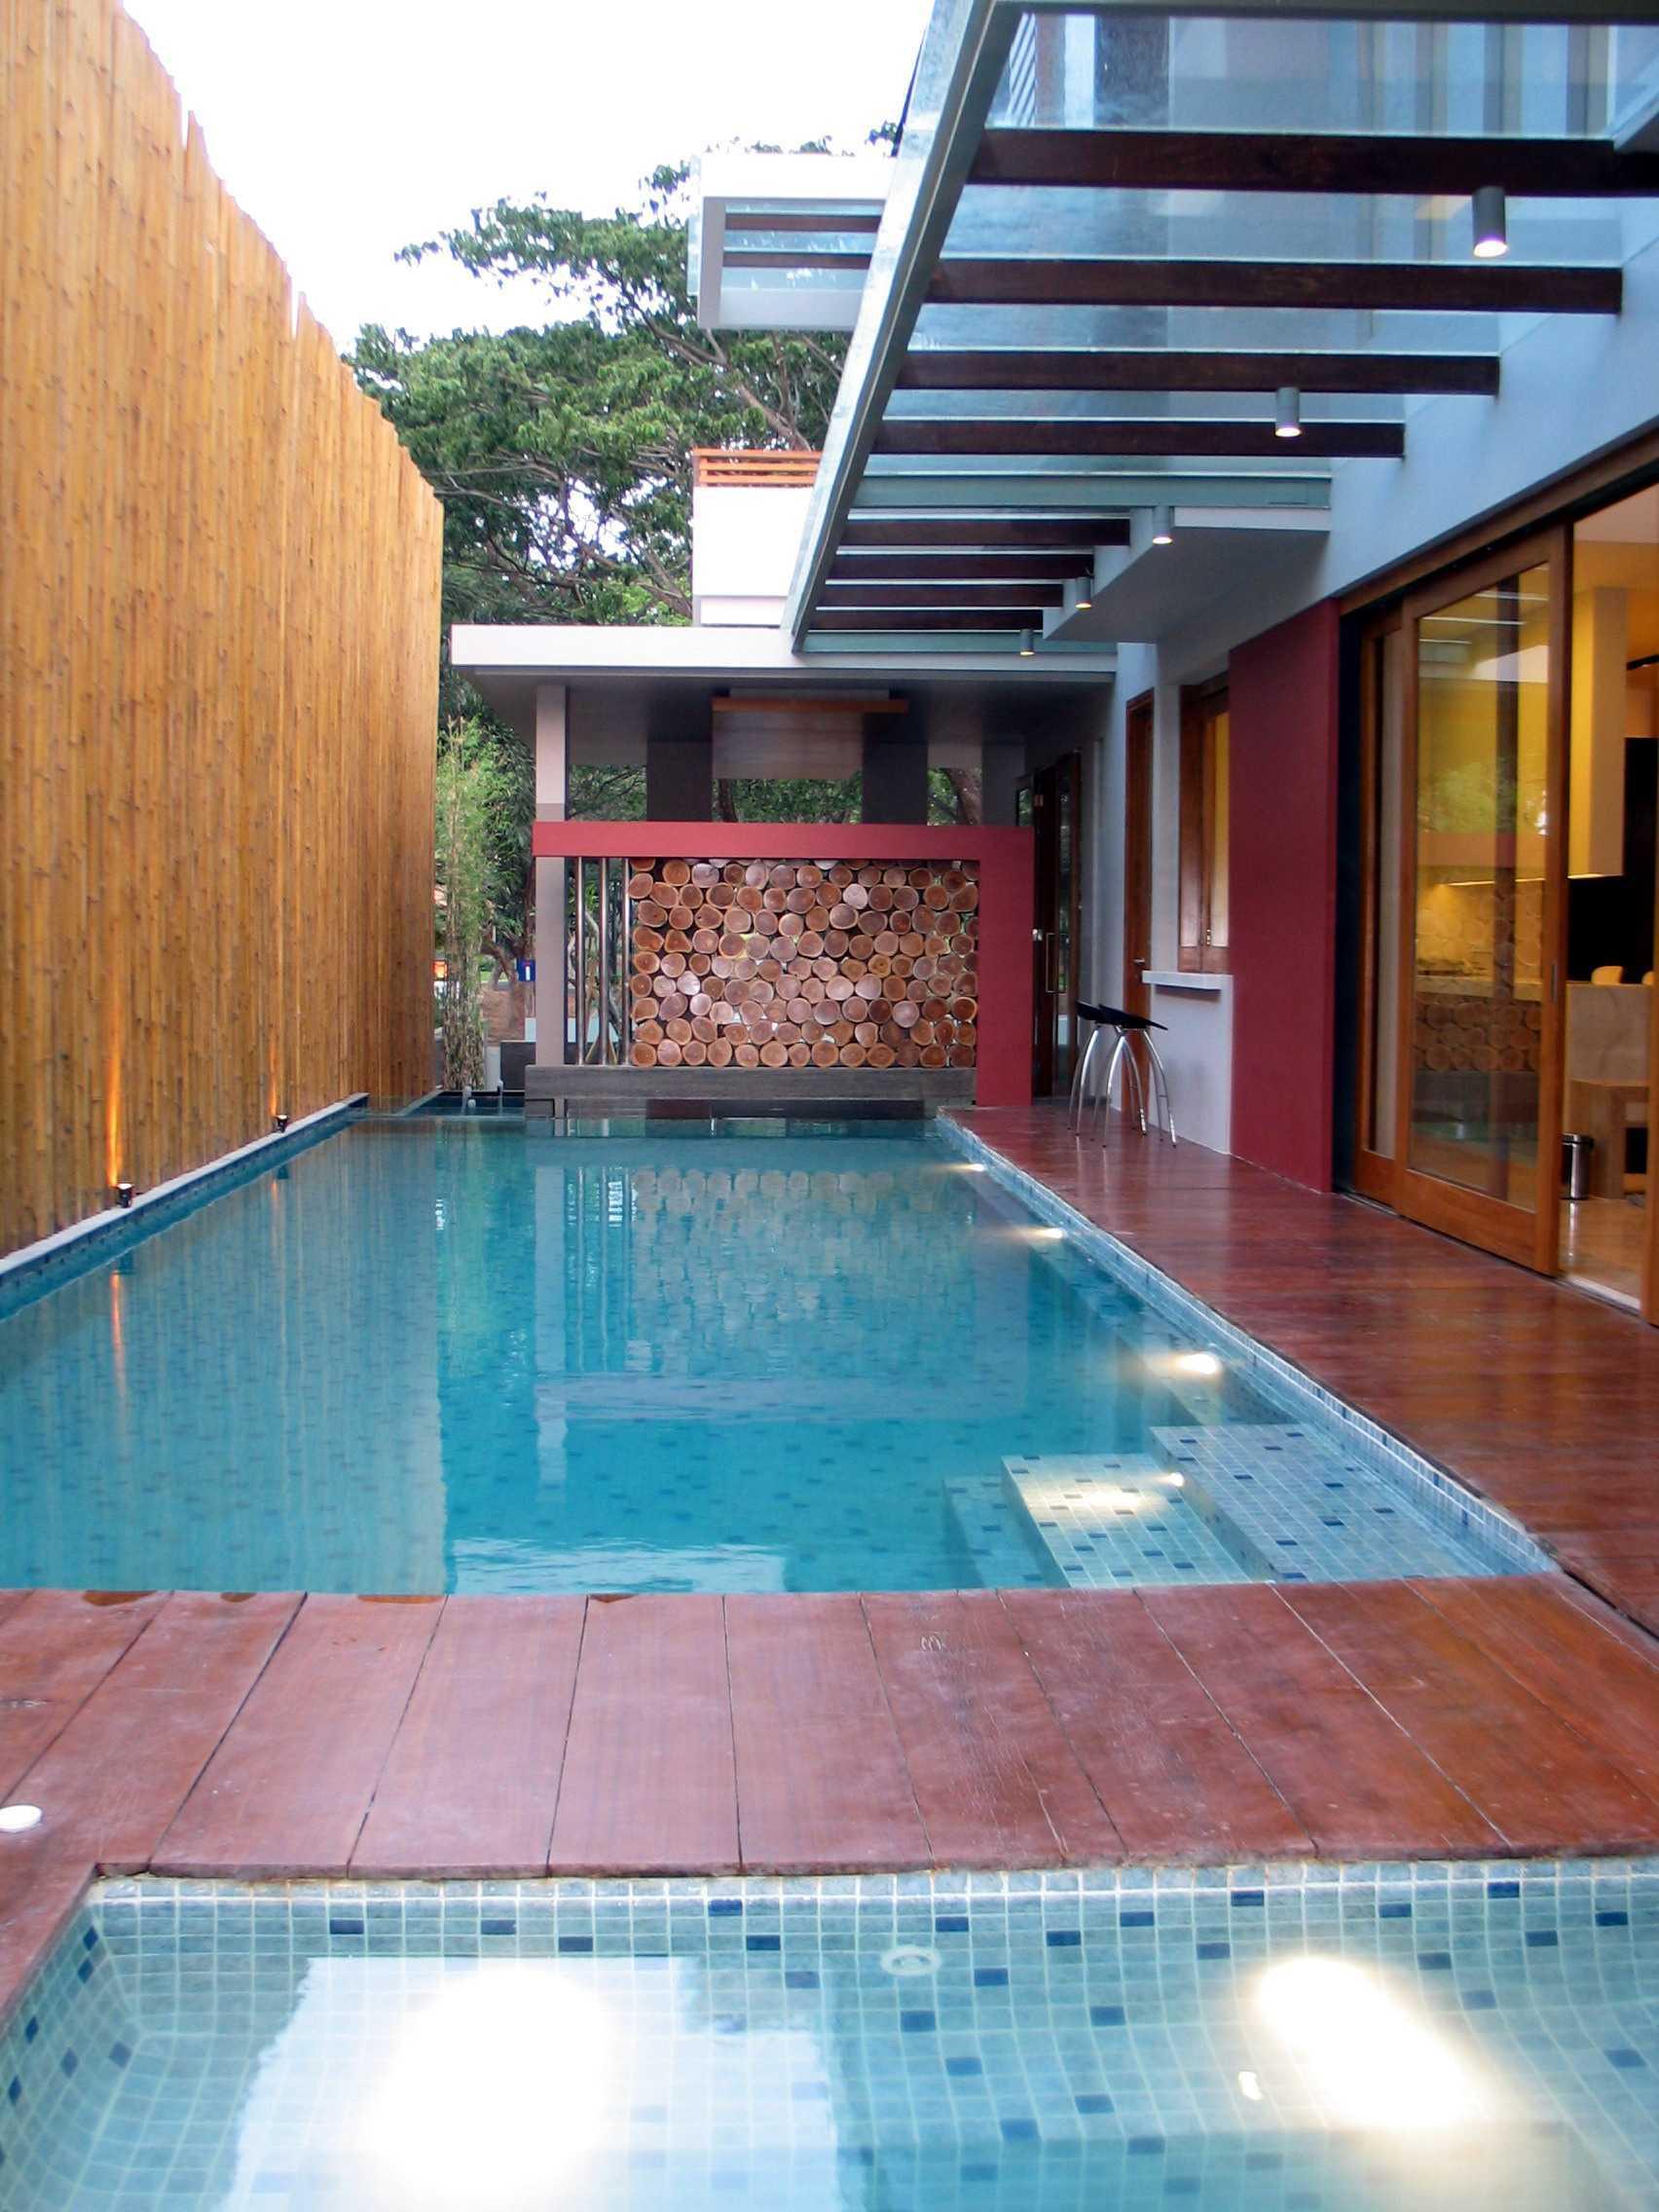 Herryj Architects Gv House Lippo Karawaci Lippo Karawaci Swimming Pool Tropis  23927